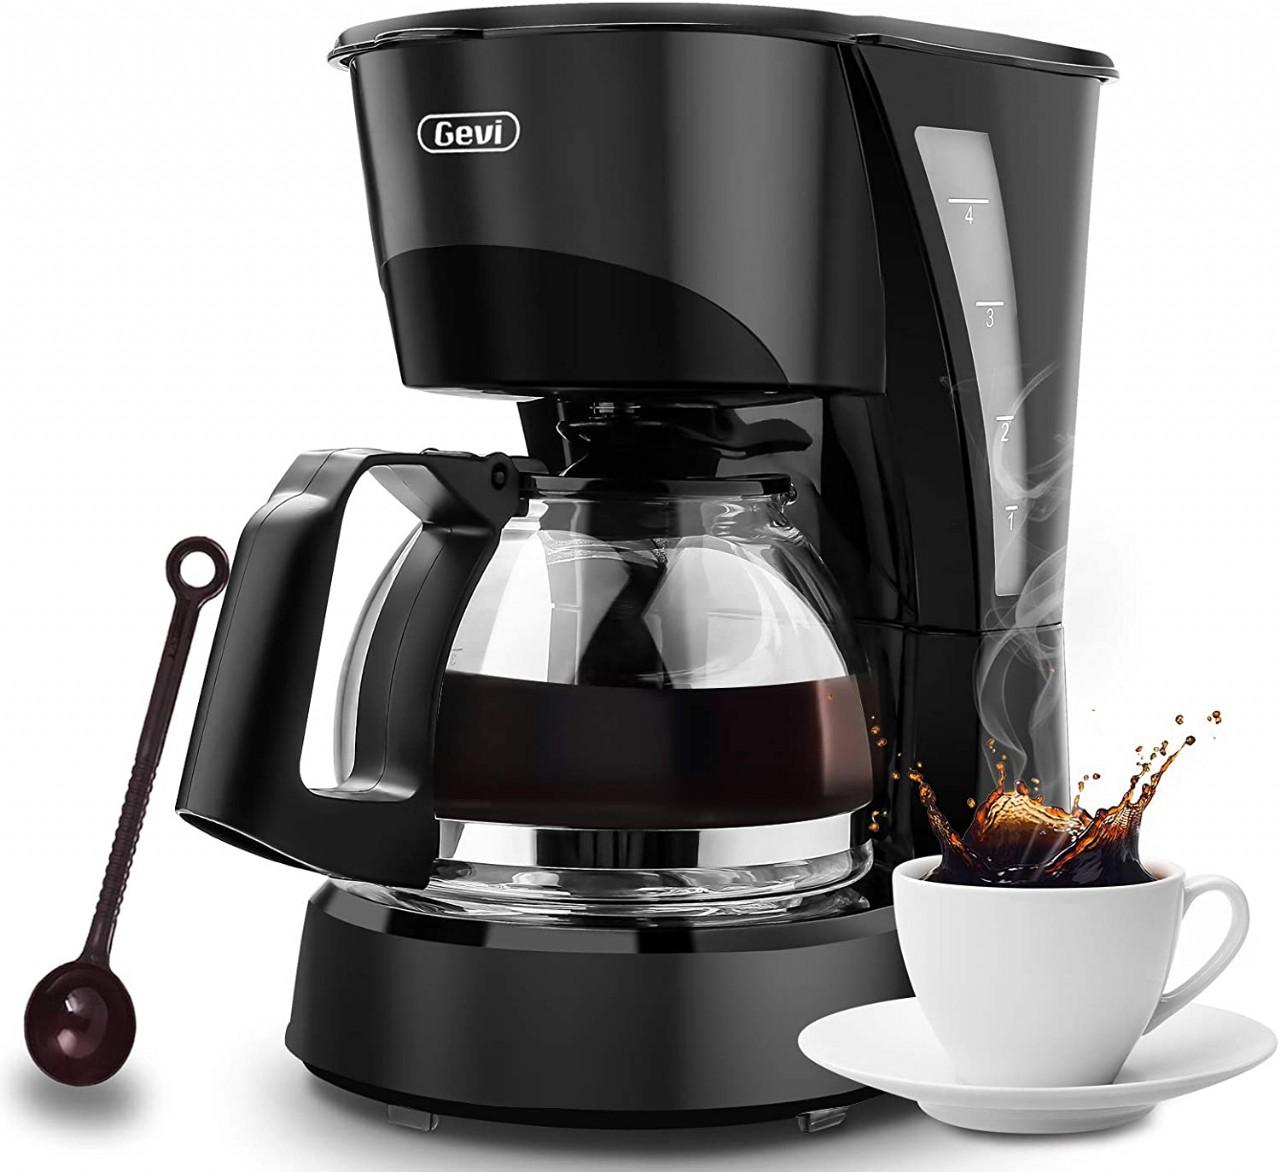 4 Cup Coffee Maker Drip Coffee Machine Silent Operation Anti-drip Coffeemaker with Coffee Pot